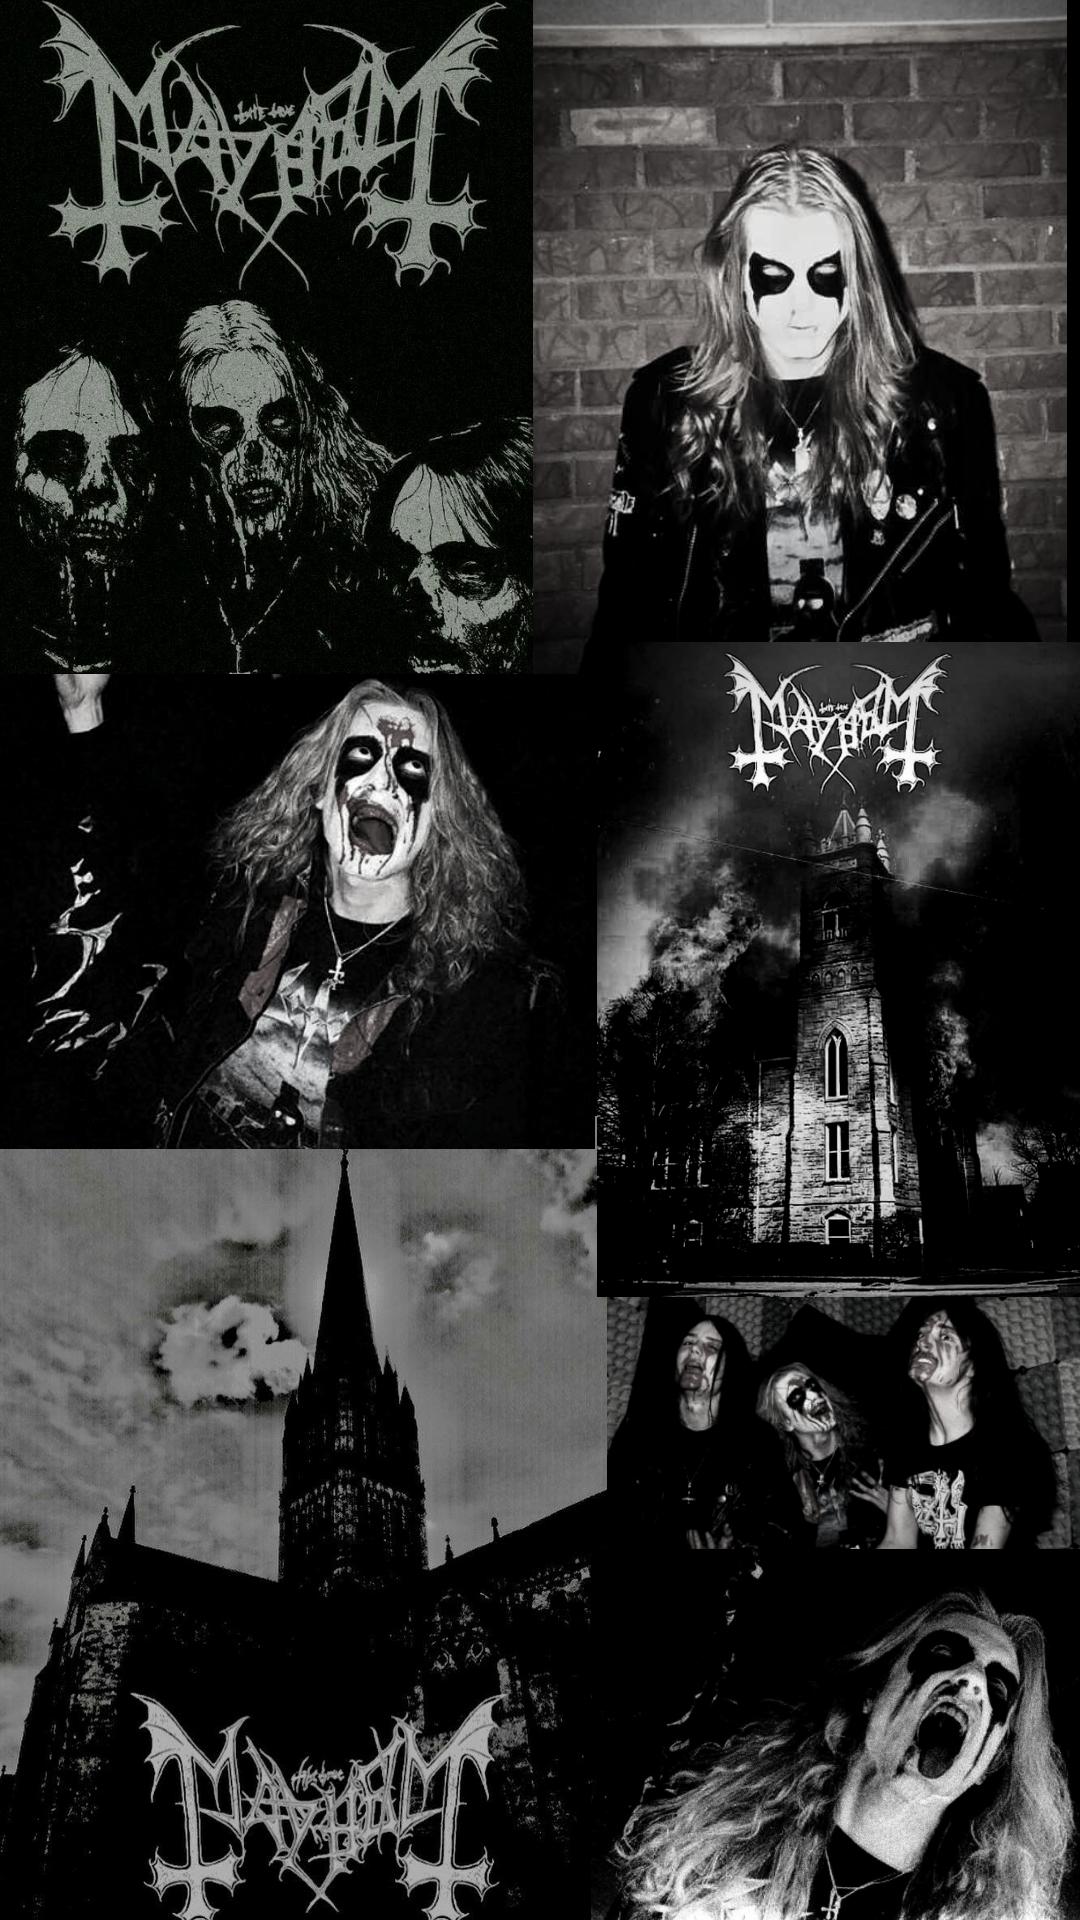 Rock Wallpaper S Black Metal Art Emo Wallpaper Mayhem Black Metal